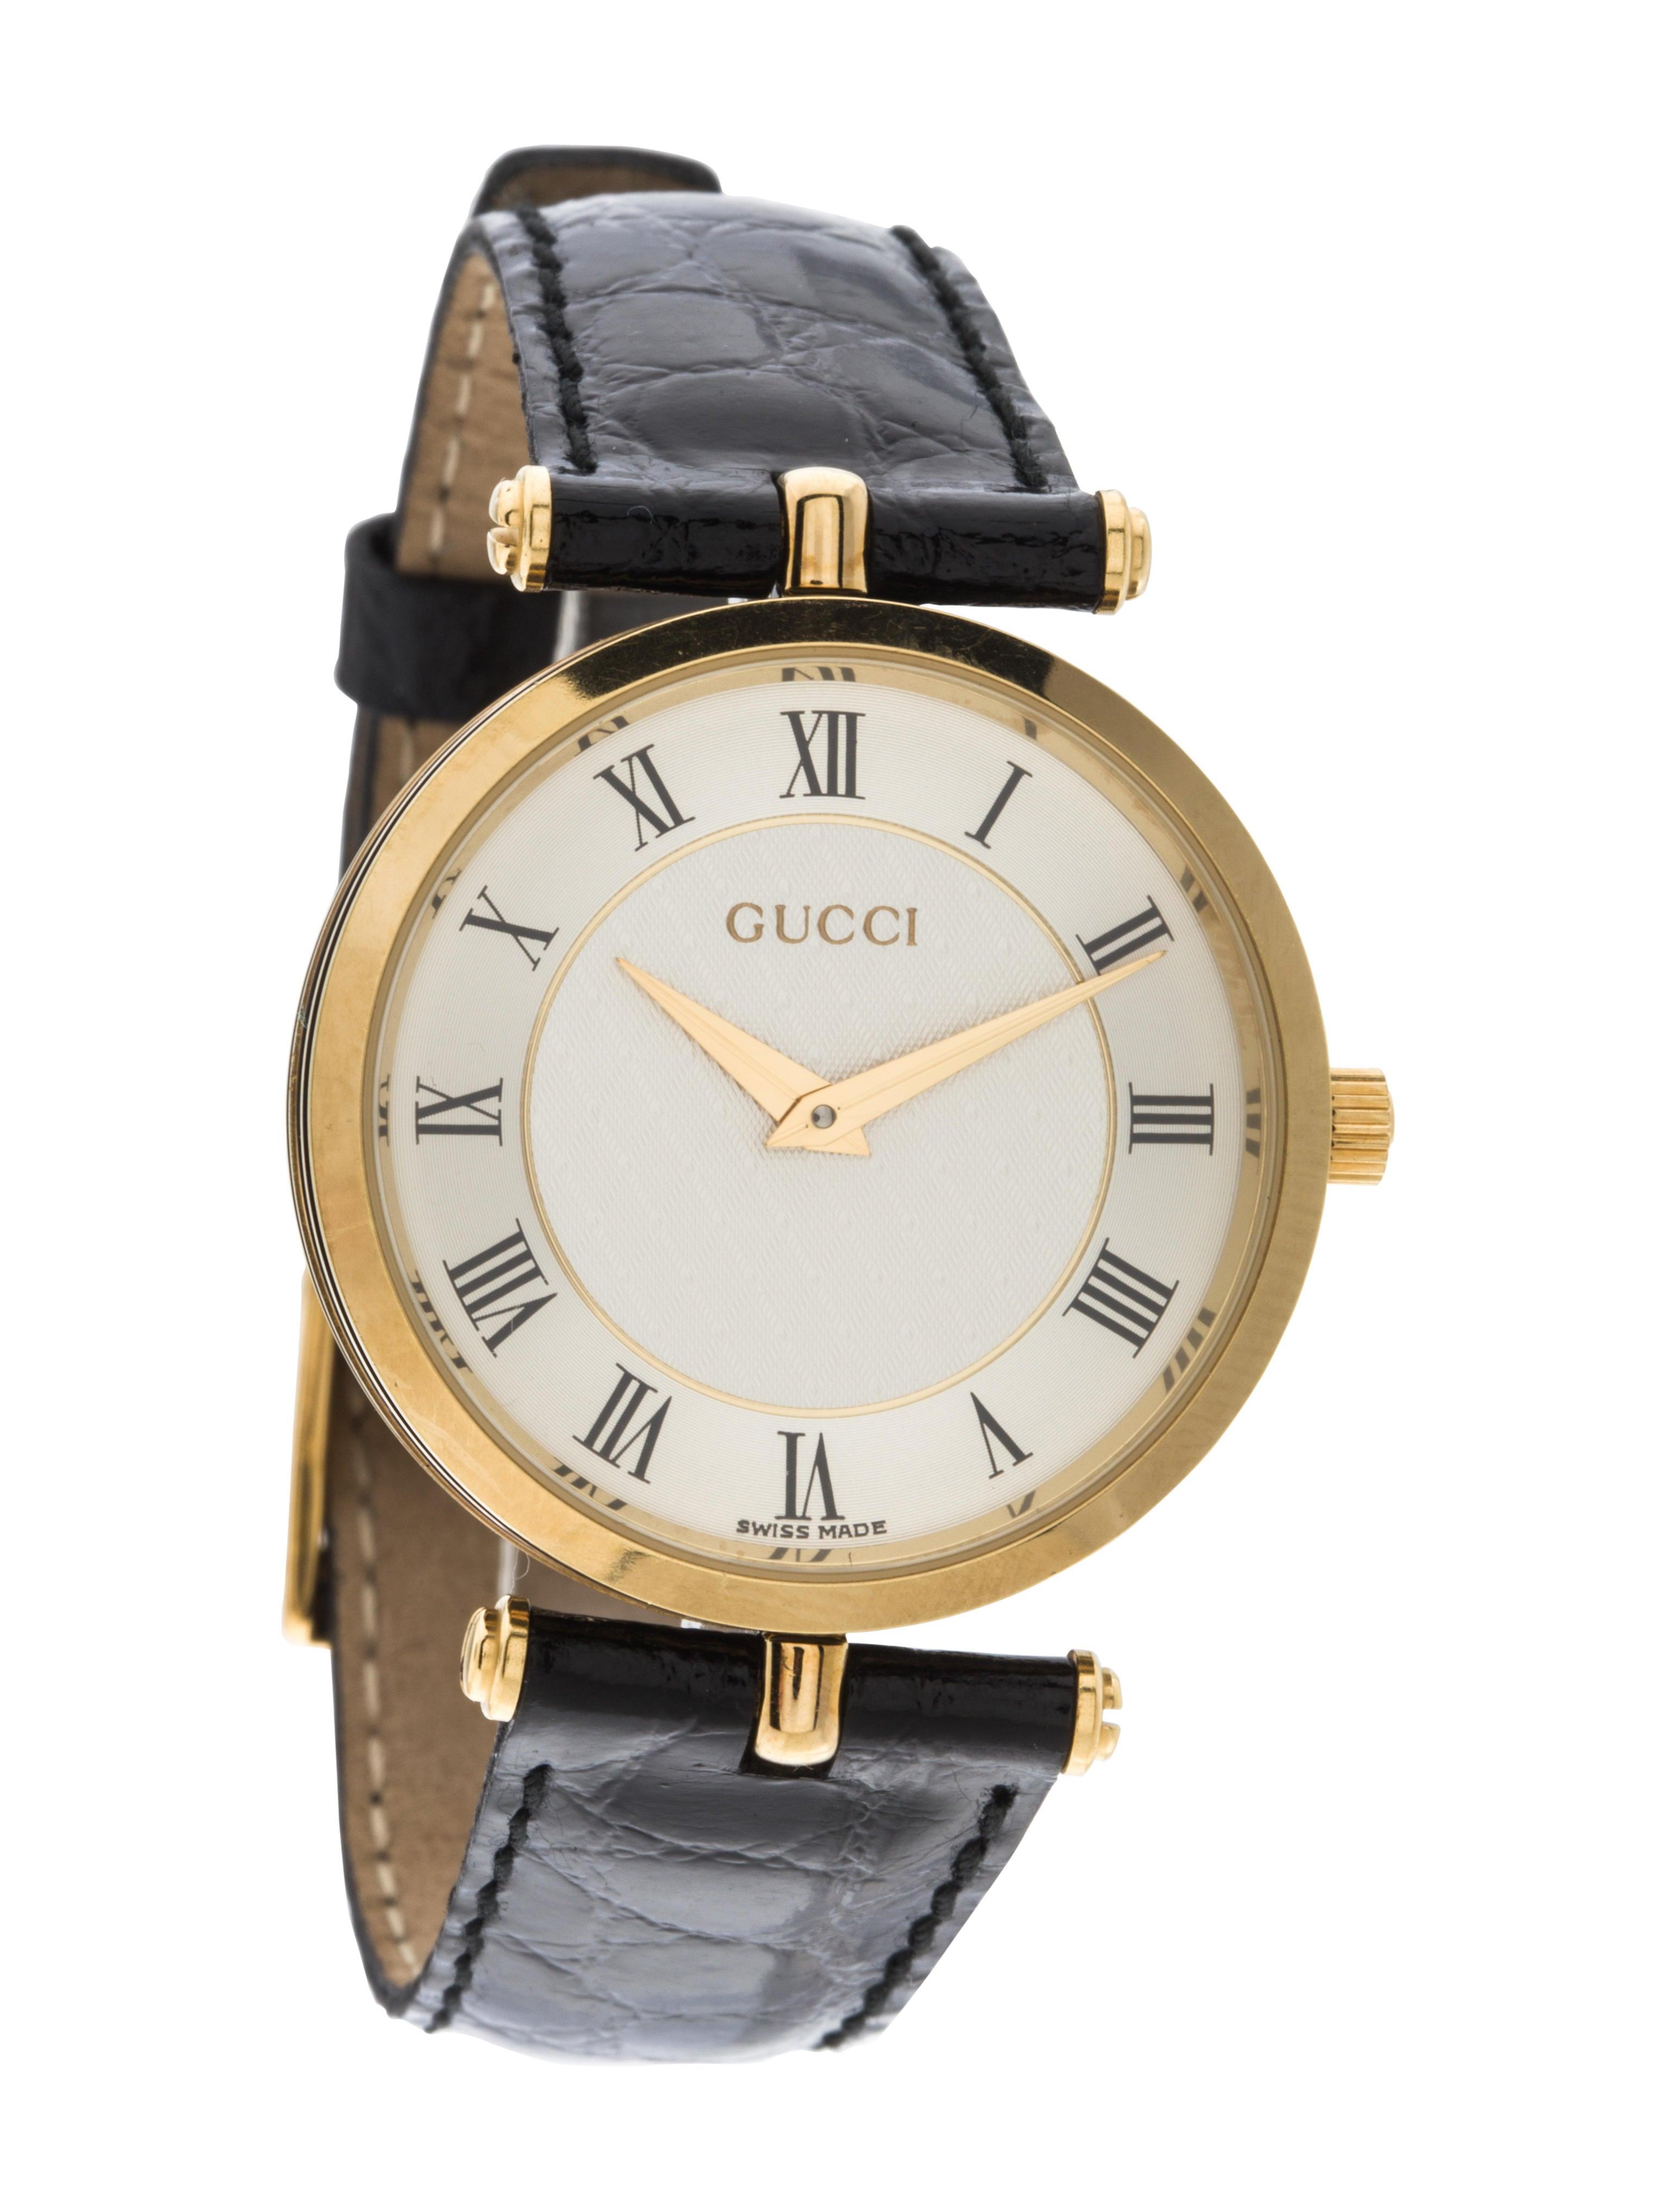 046fcef7789 Gucci 2000m Watch - Strap - GUC124868